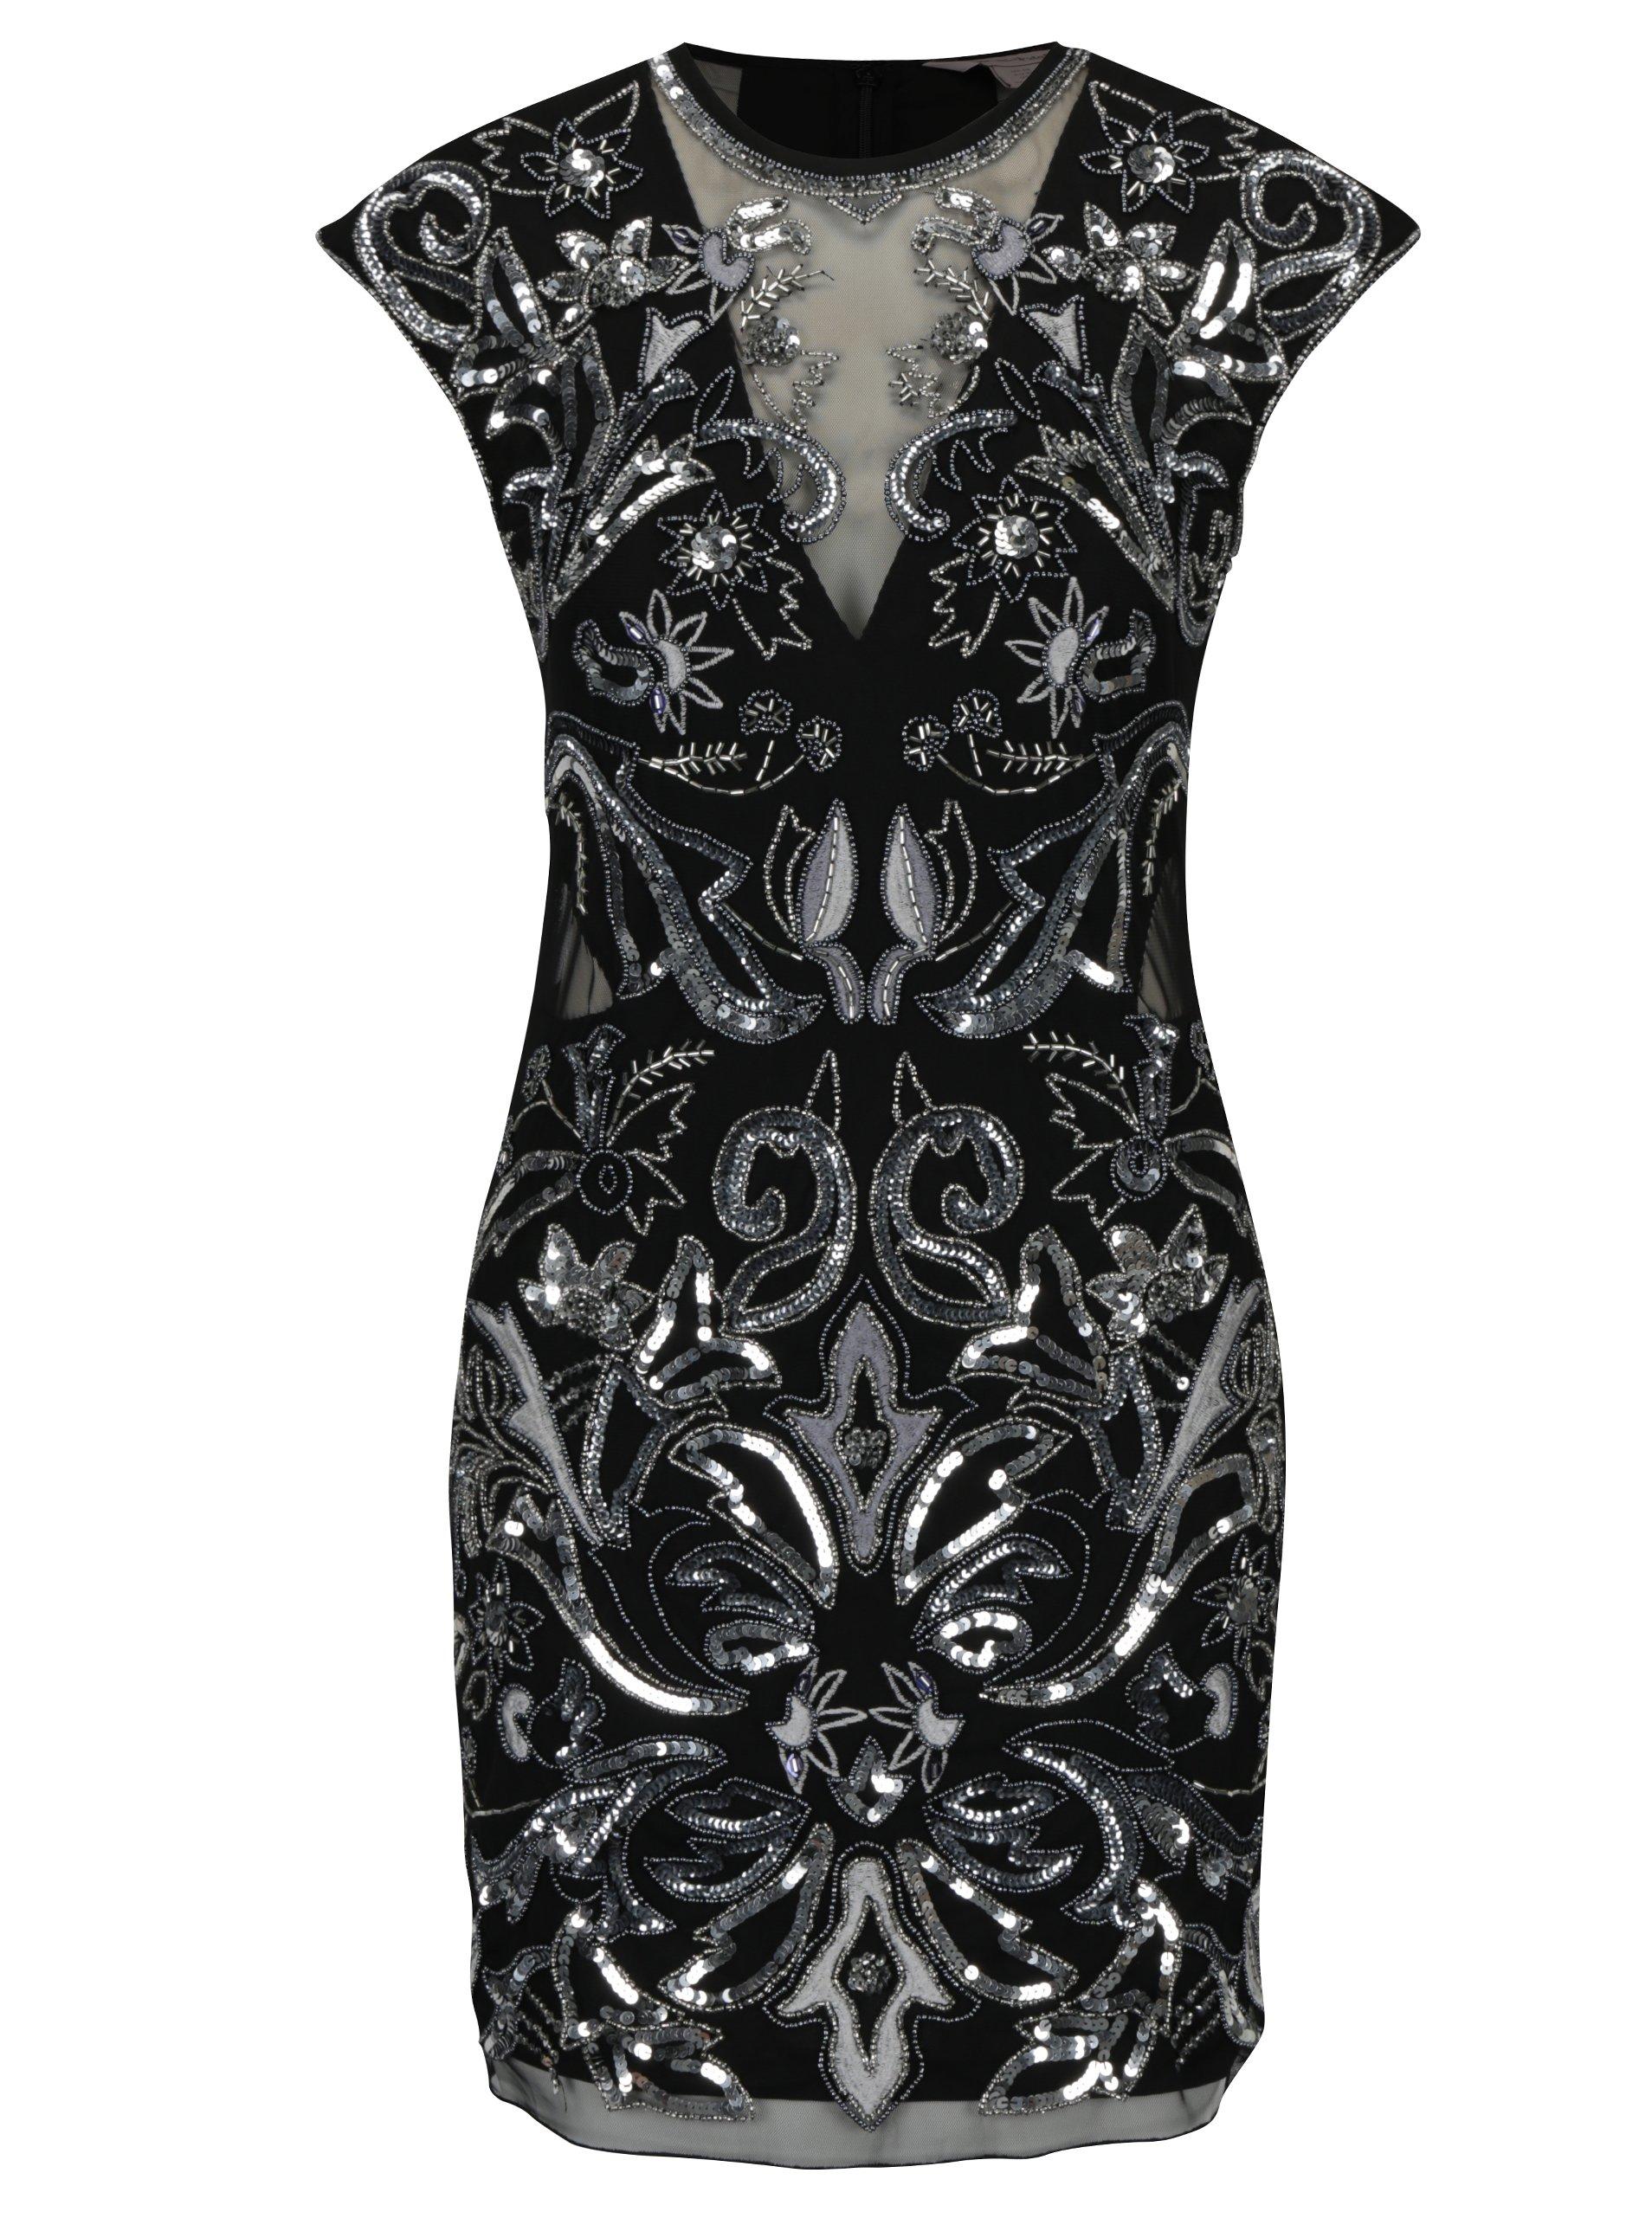 a57107d4efd0 Čierne šaty s flitrami